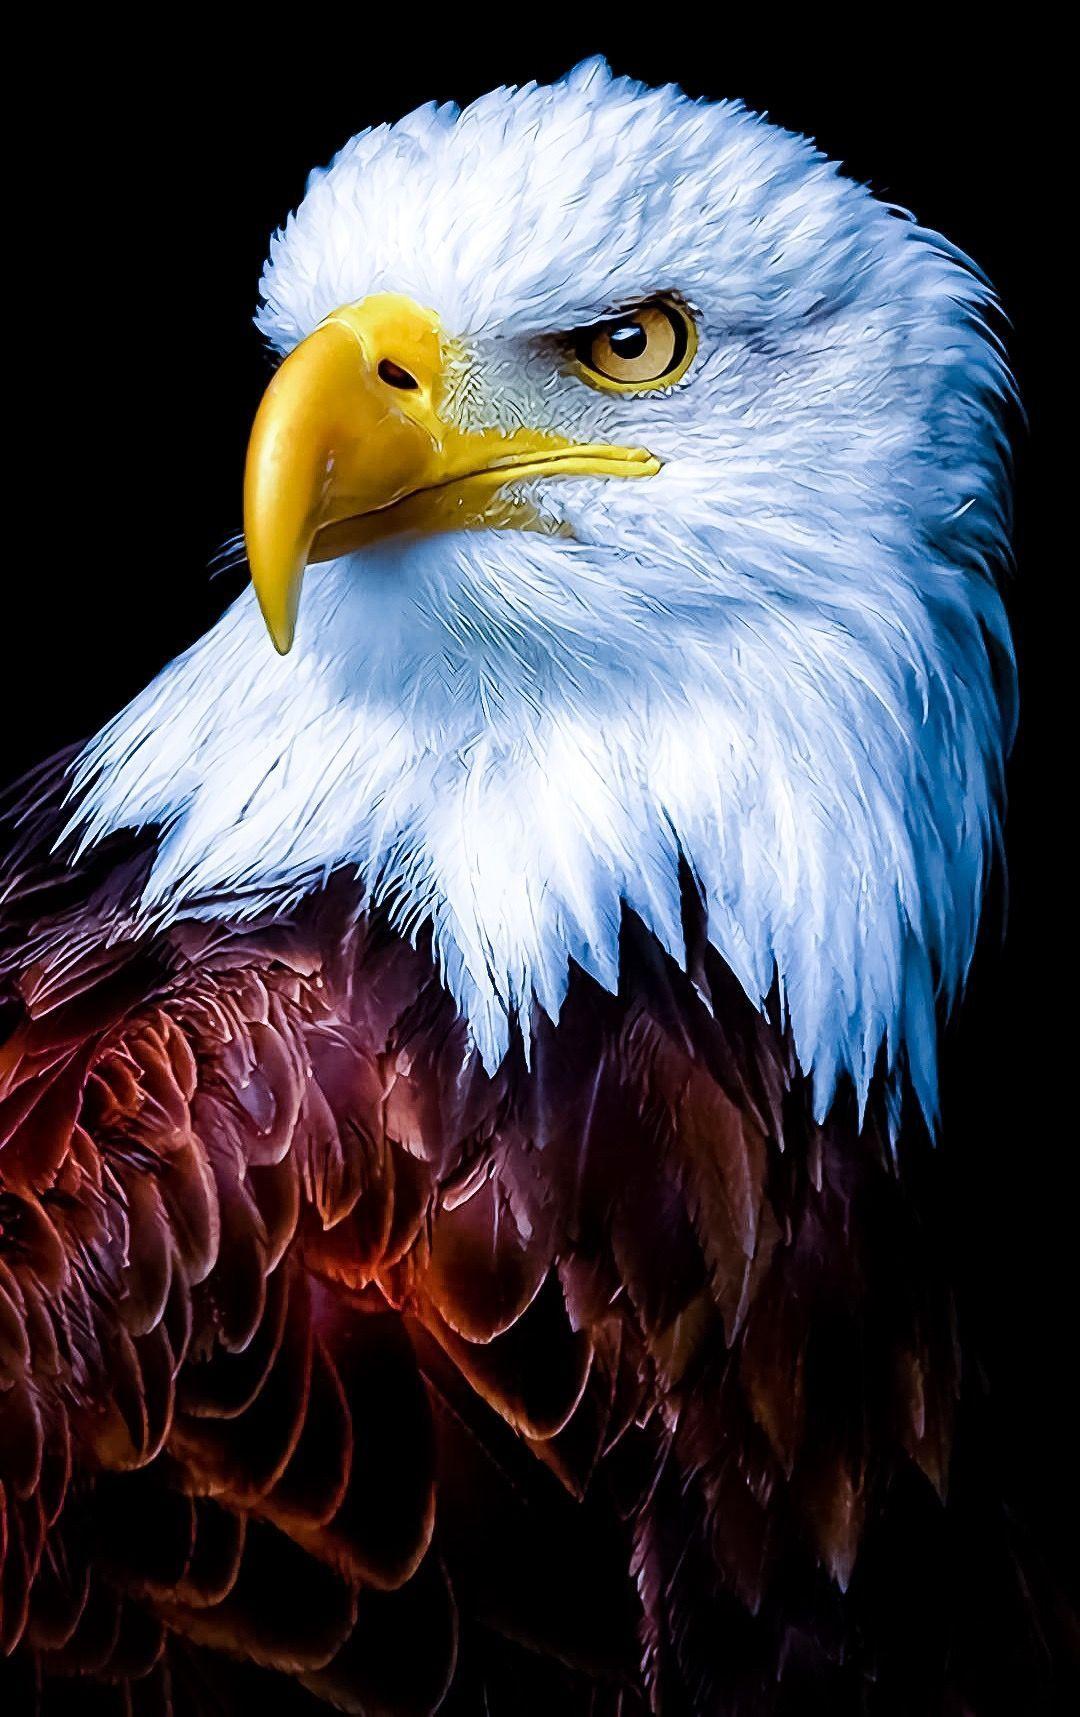 How Eagle Hunt Its Prey How Eagle Hunt Its Prey Eagle Baldeagle Bird Birds Inflight Fish In 2020 Eagle Pictures Eagle Wallpaper Haliaeetus Leucocephalus